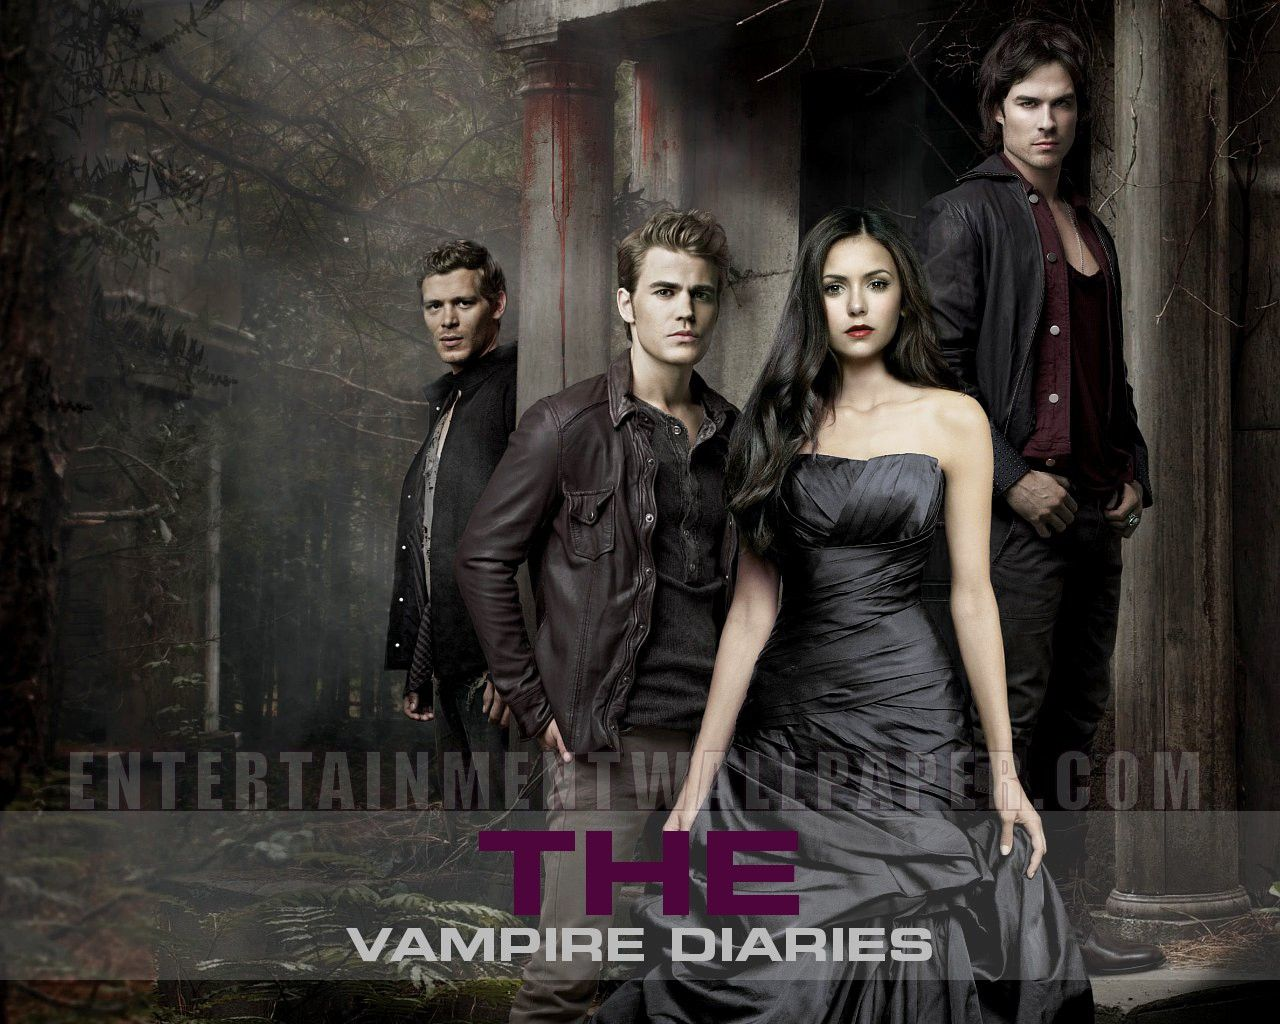 The Vampire Diaries The Originals Vampire Diaries Wallpaper